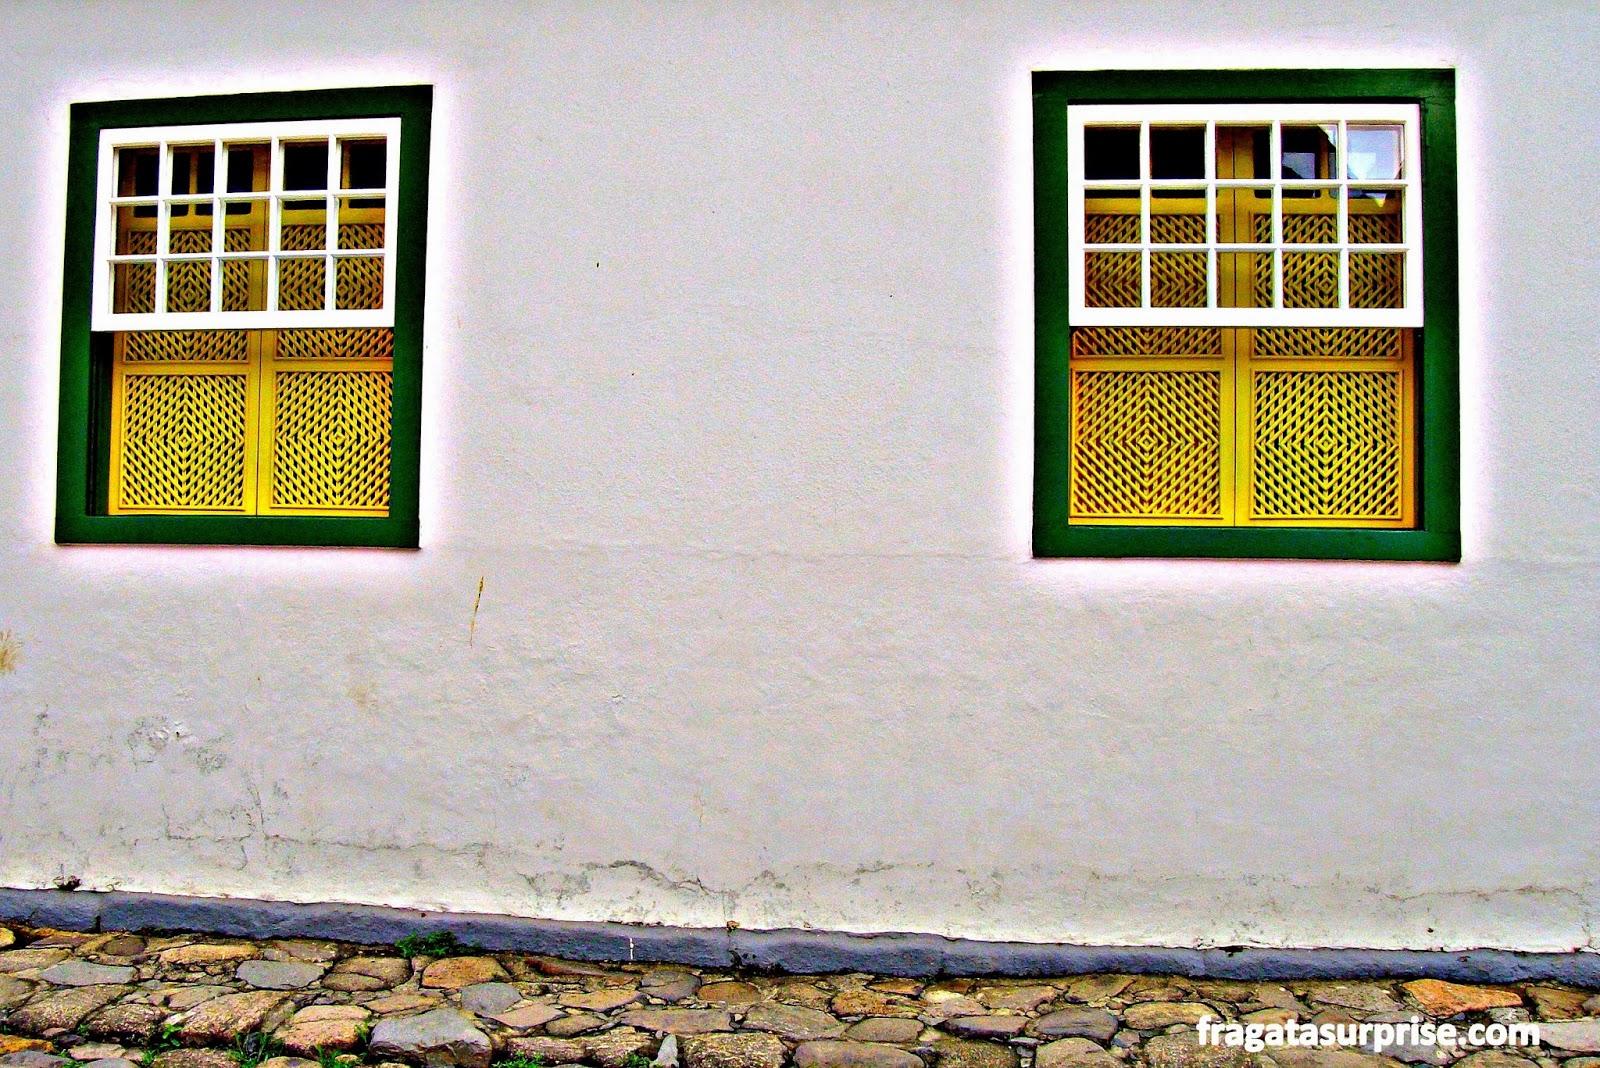 #B5A016 Fragata Surprise: Paraty: arco íris nas janelas 570 Janelas Em Arco Pleno